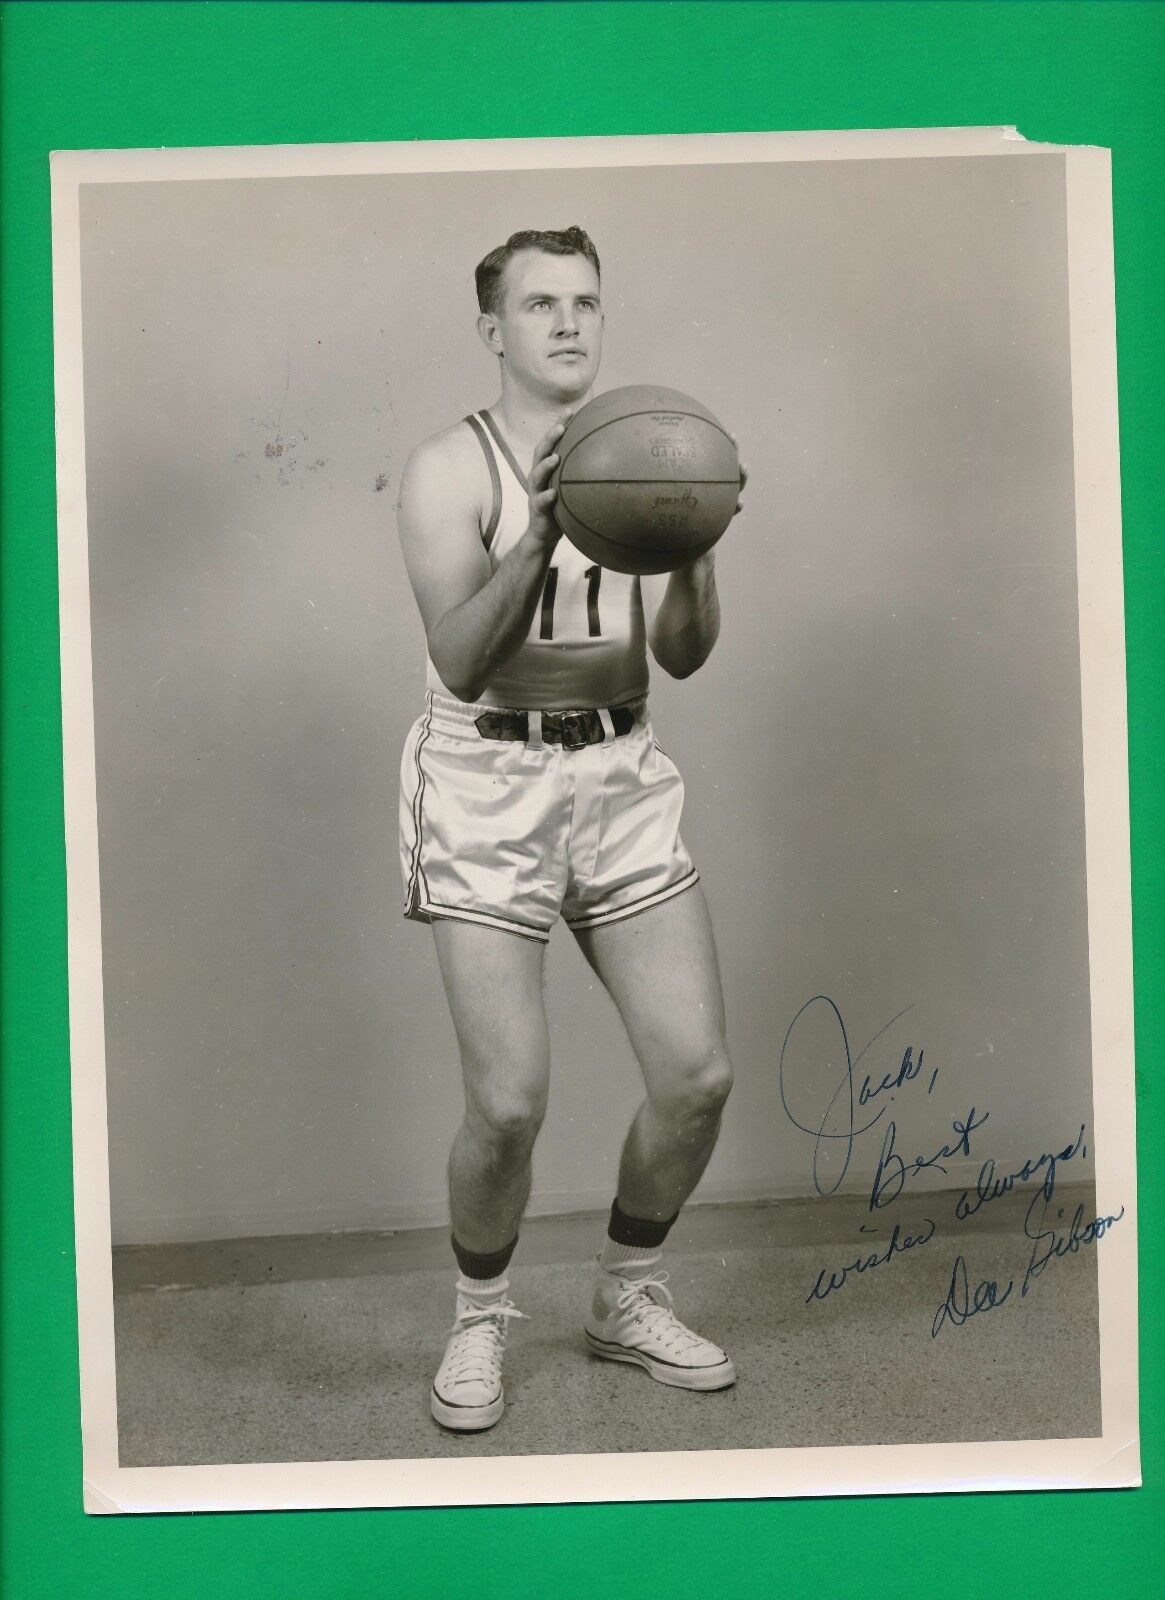 ORIGINAL 1946 DEE GIBSON SIGNED WESTERN KENTUCKY BASKETBALL PHOTO + Letter